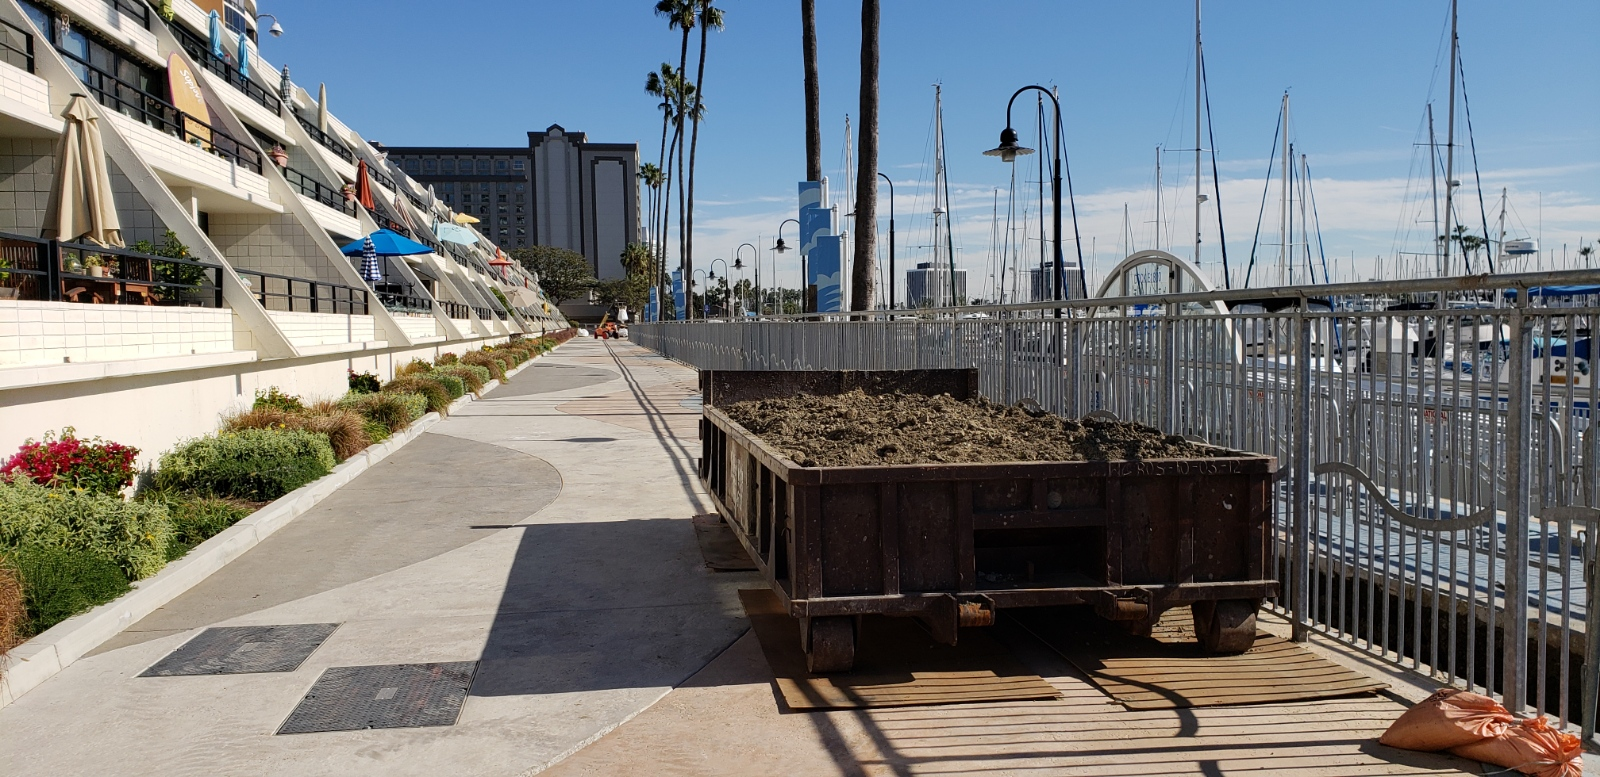 Dirt dumpster rental in Marina Del Rey